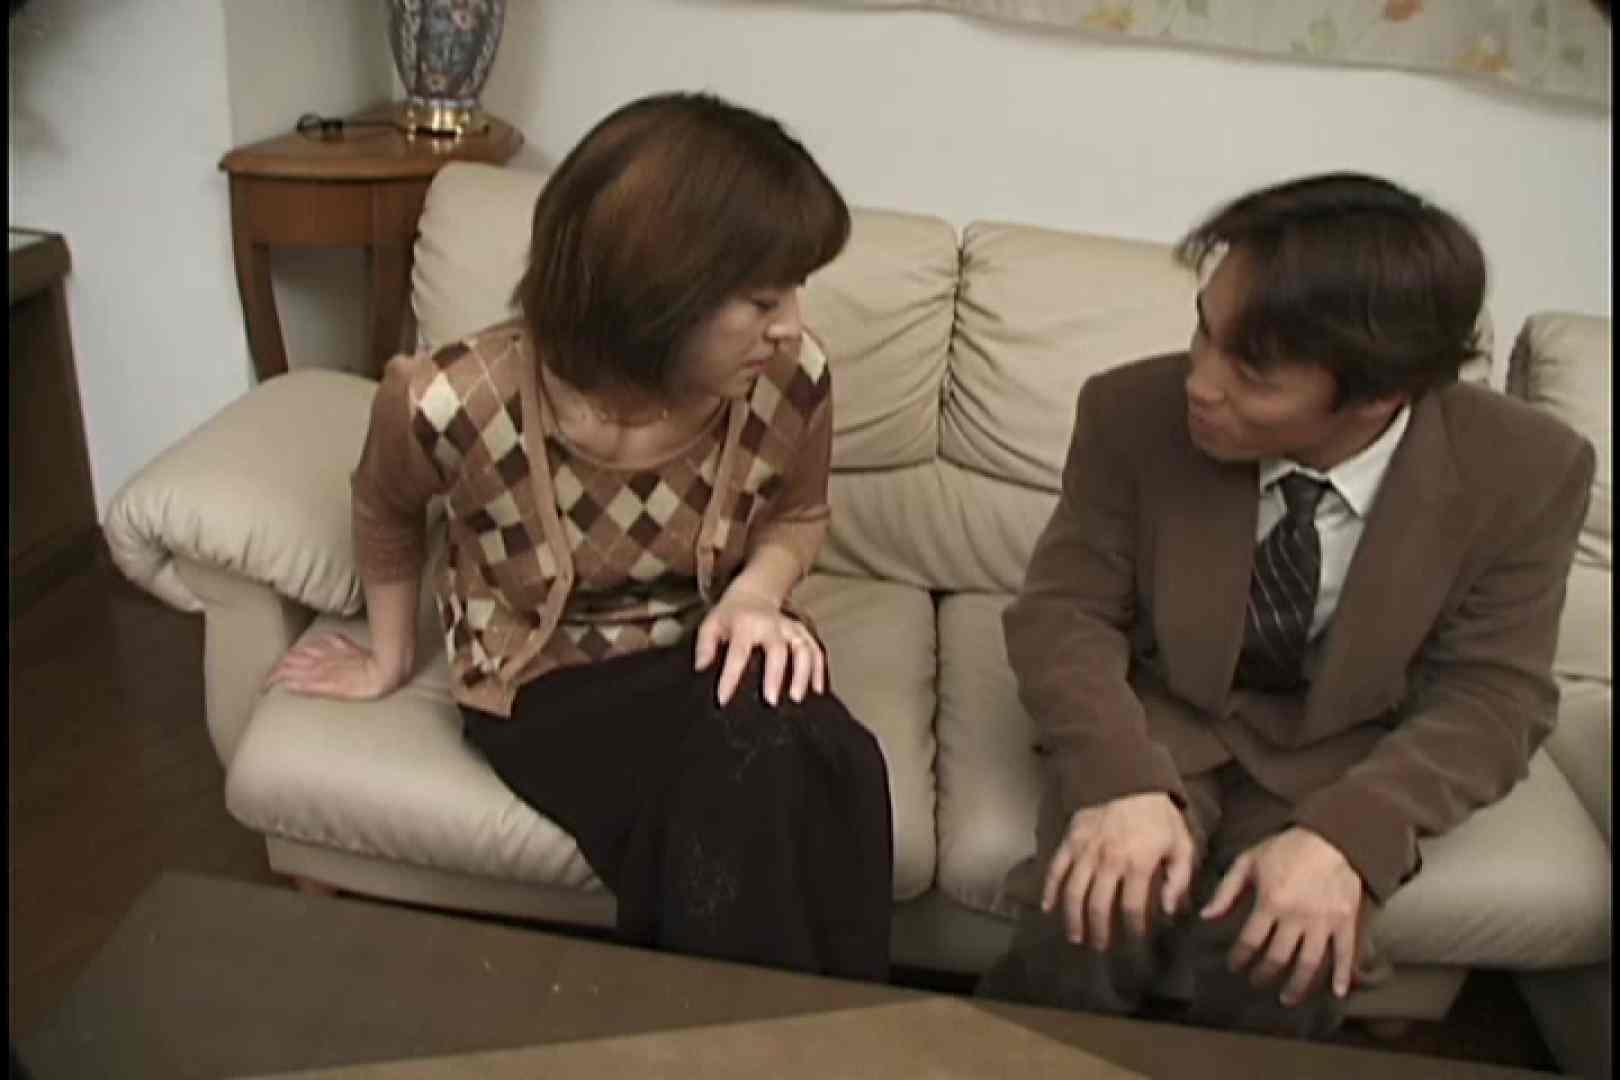 昼間の奥様は欲求不満 ~石川麻紀~ 熟女  69枚 14